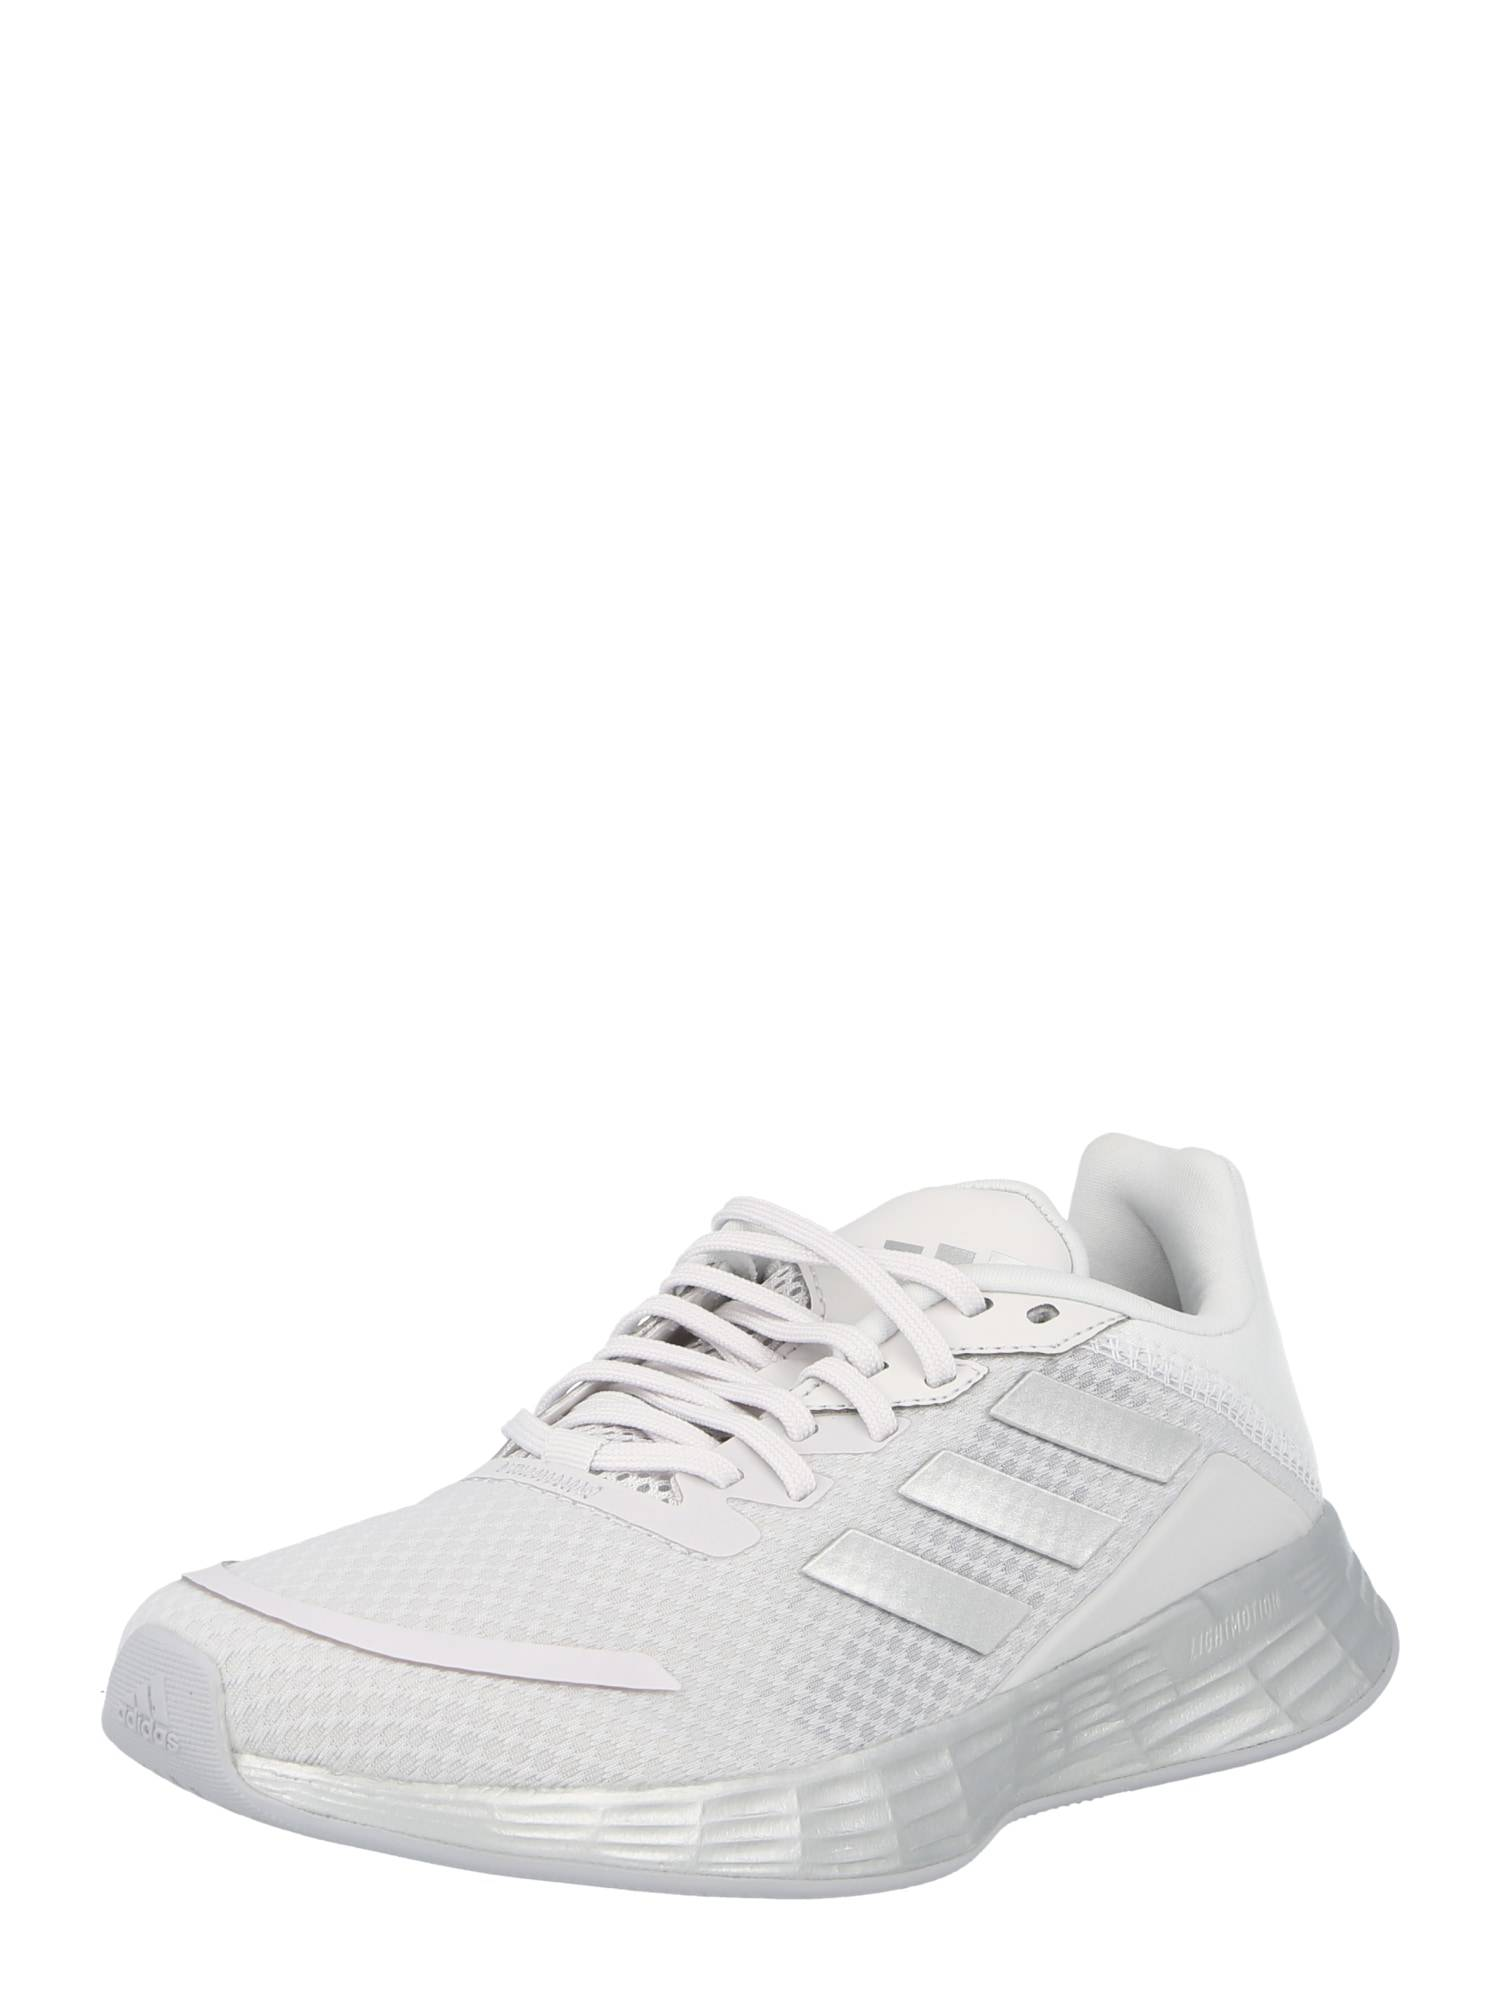 ADIDAS PERFORMANCE Chaussure de course 'Duramo'  - Blanc - Taille: 6 - male